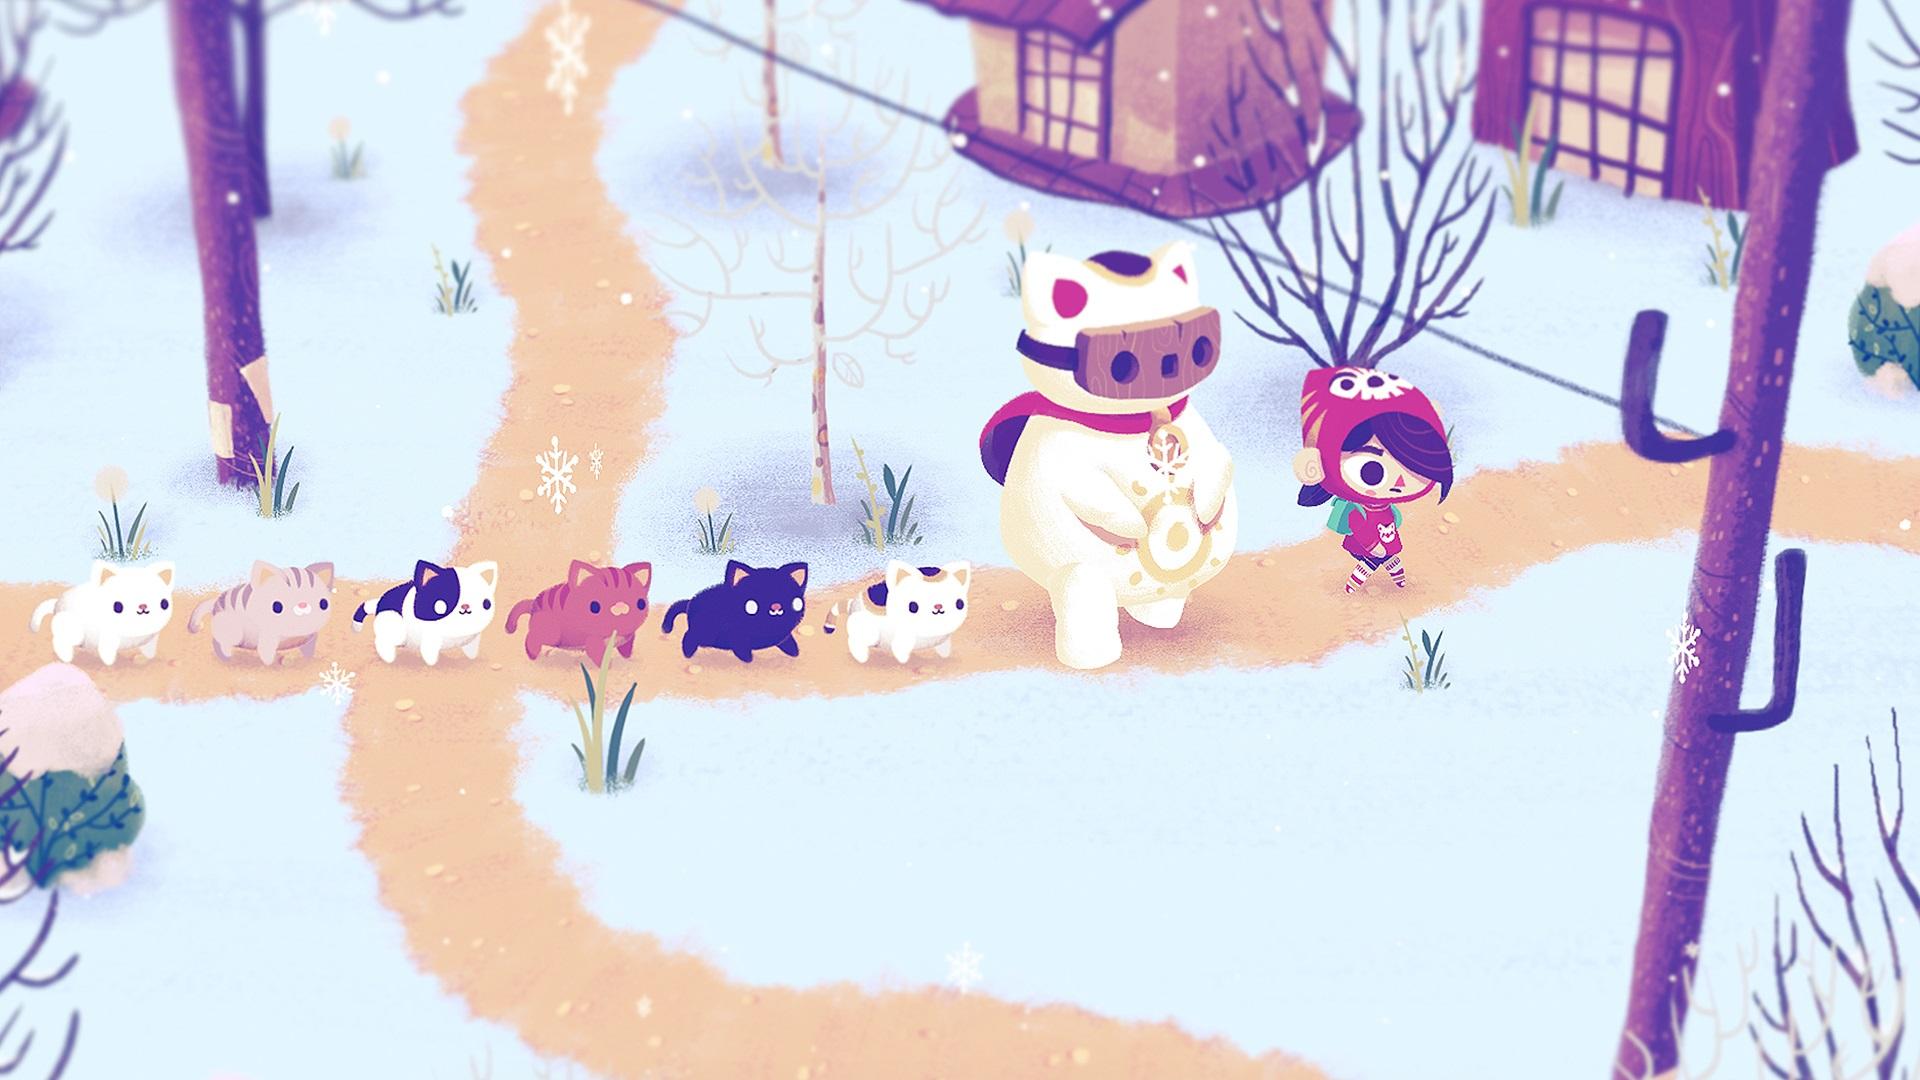 Image of: Fighting Minekos Night Market Meowza Games Indie Game Harvest Moon Animal Crossing The Indie Game Website Minekos Night Market Meowza Games Indie Game Harvest Moon